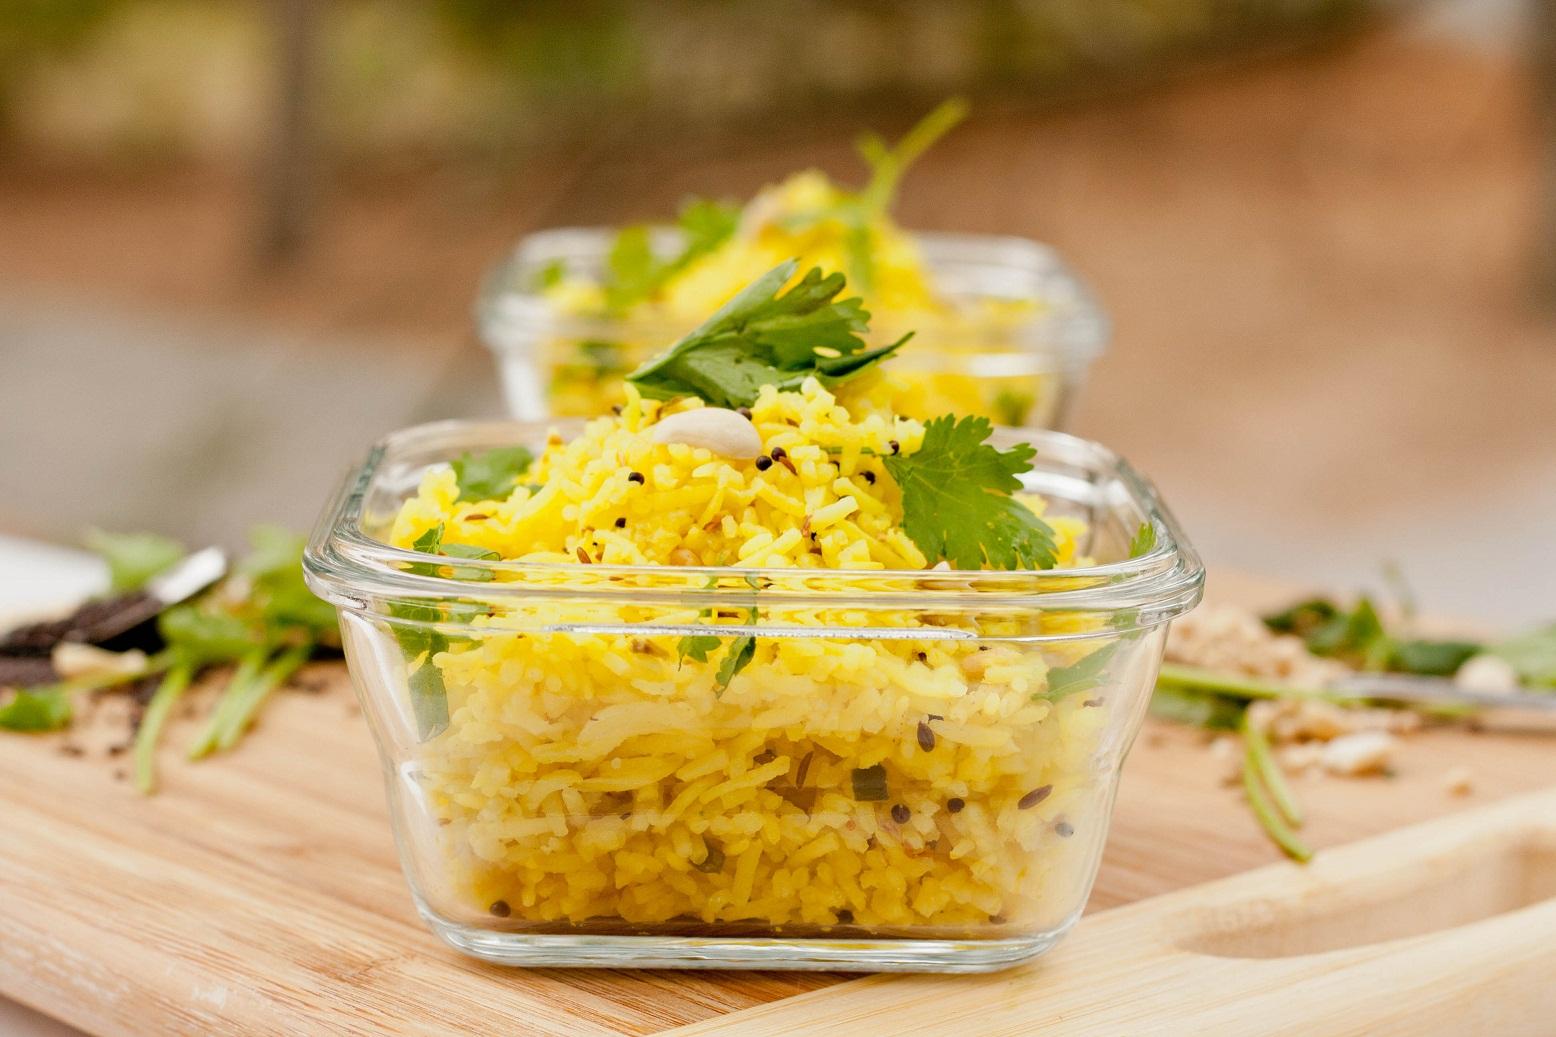 lemon-rice-11-1-of-1